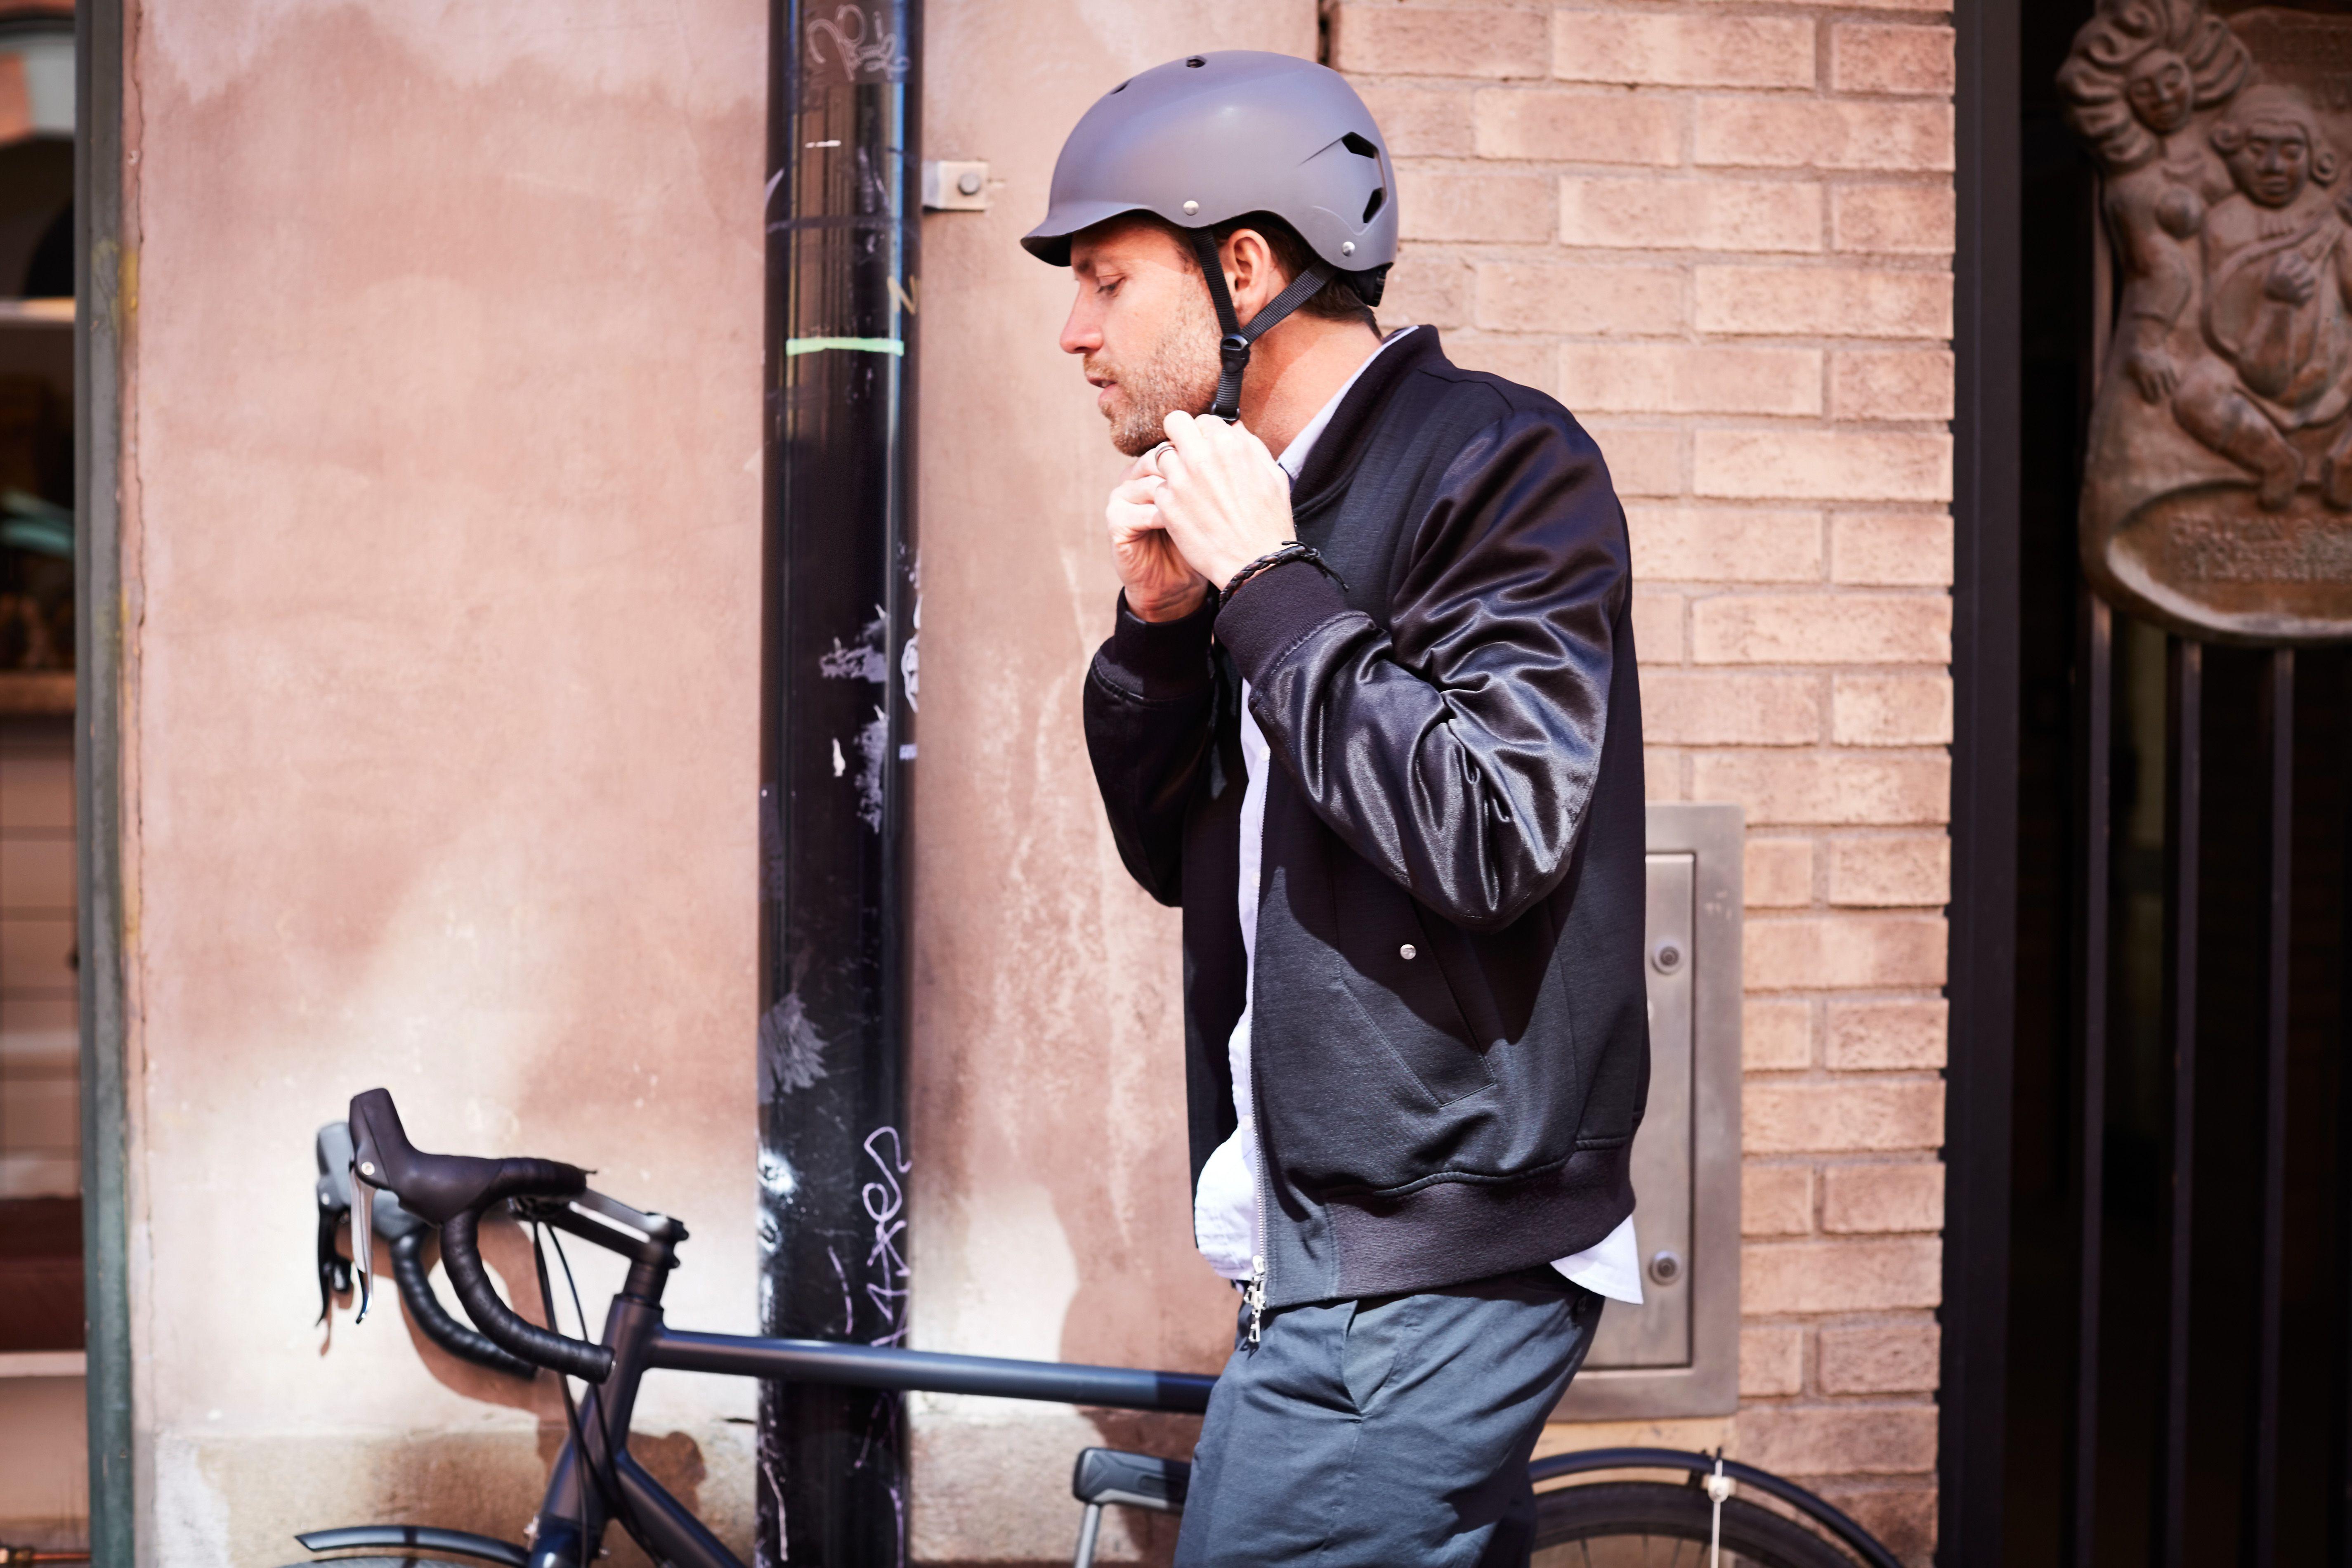 Bike Helmet Safety Should I Wear A Bike Helmet